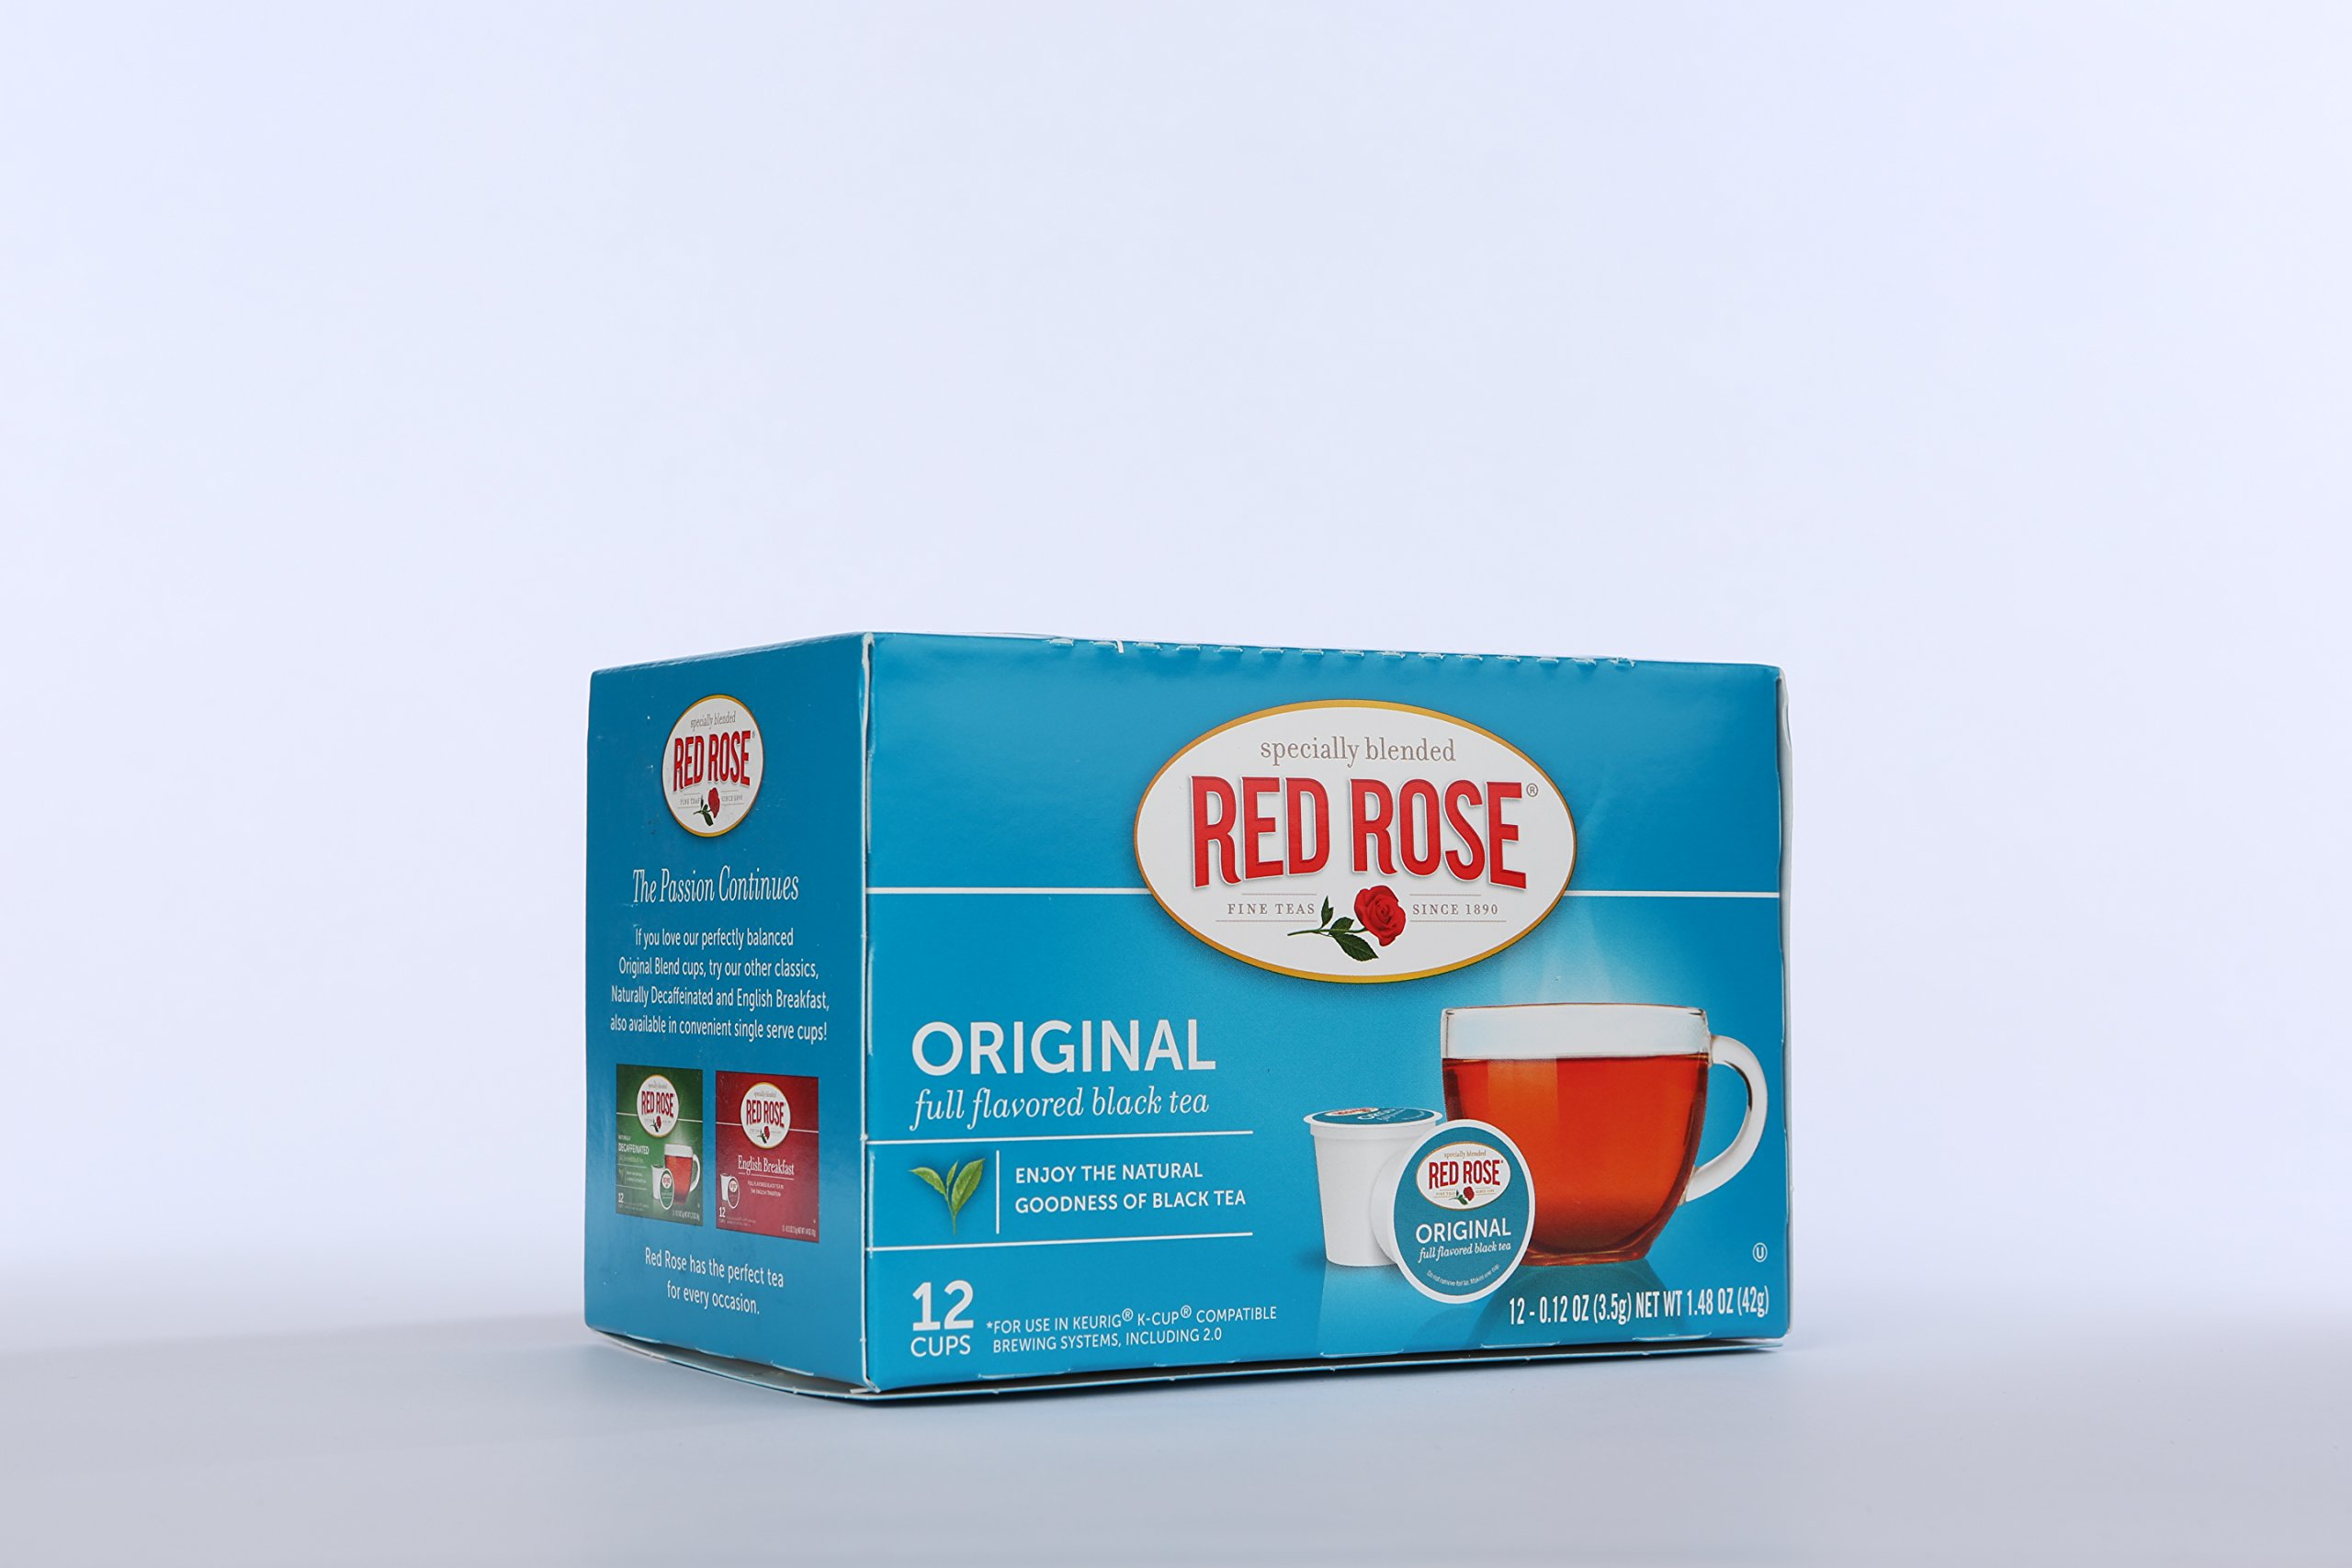 Red Rose Original Black Tea Single Serve Cups, 12 Count (Pack of 6)